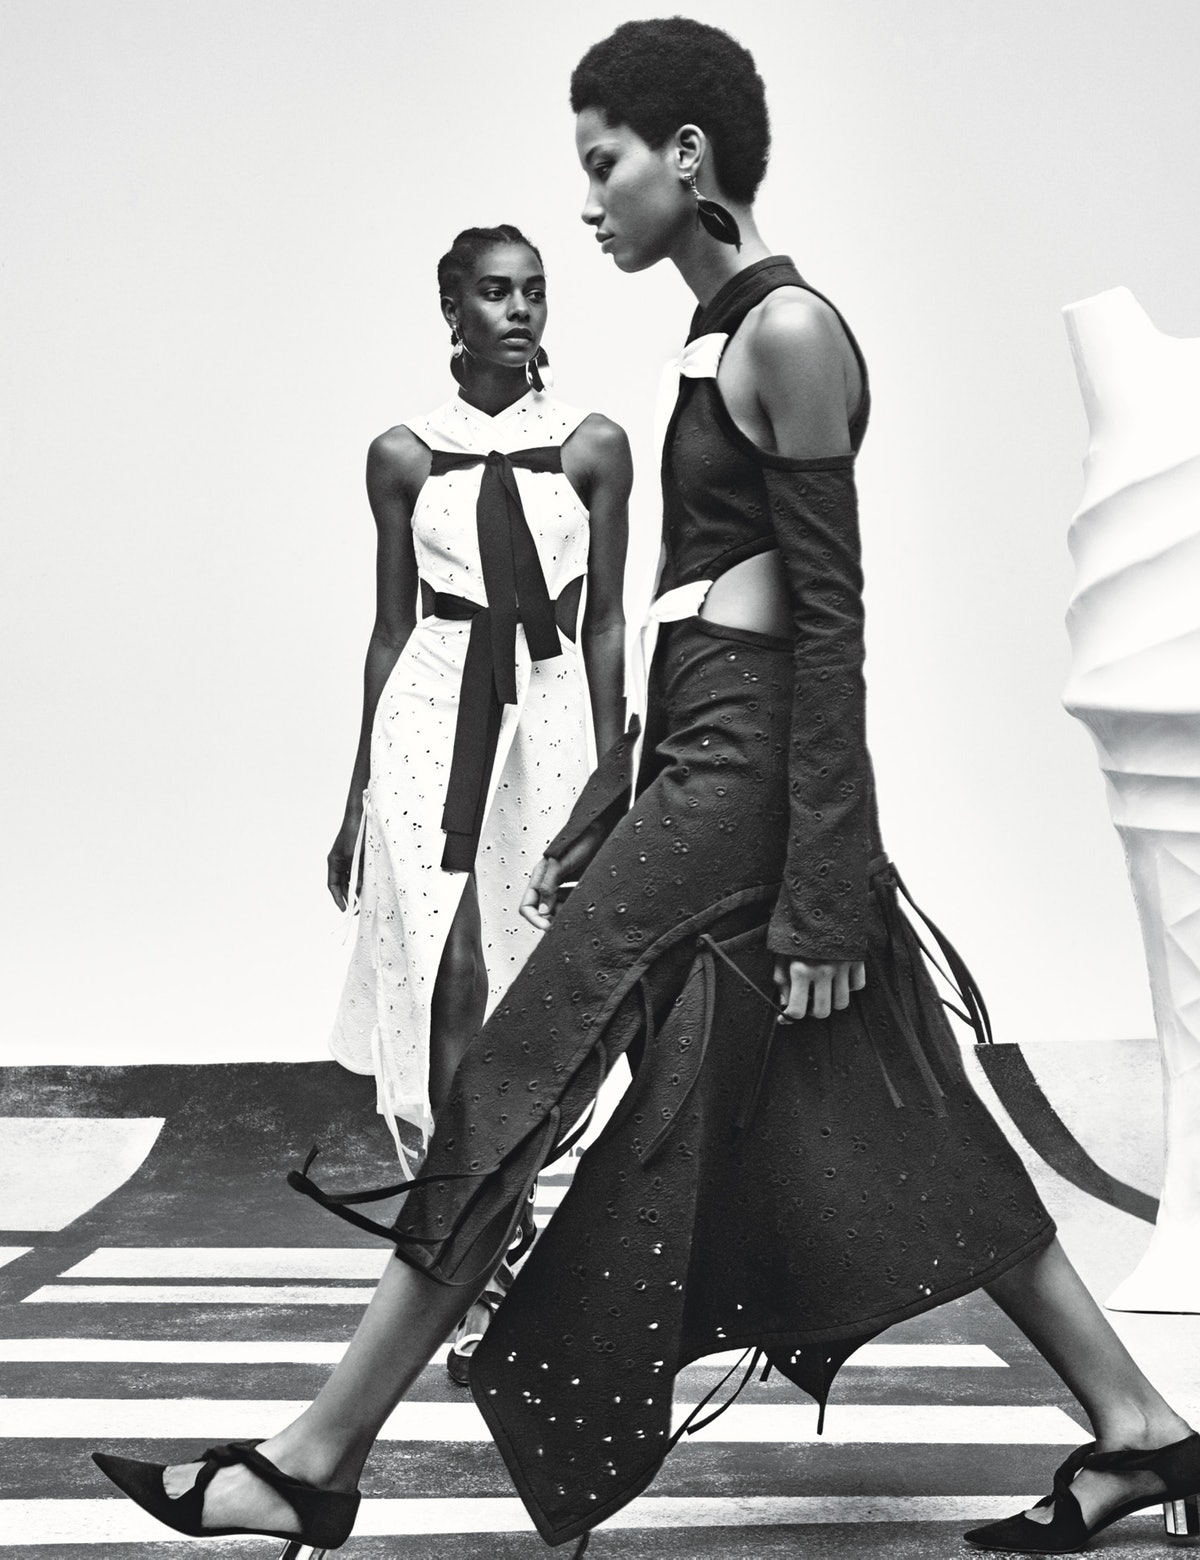 Lineisy-Montero-Karly-Loyce-Tami-Williams-W-Magazine-Craig-McDean-01.jpg